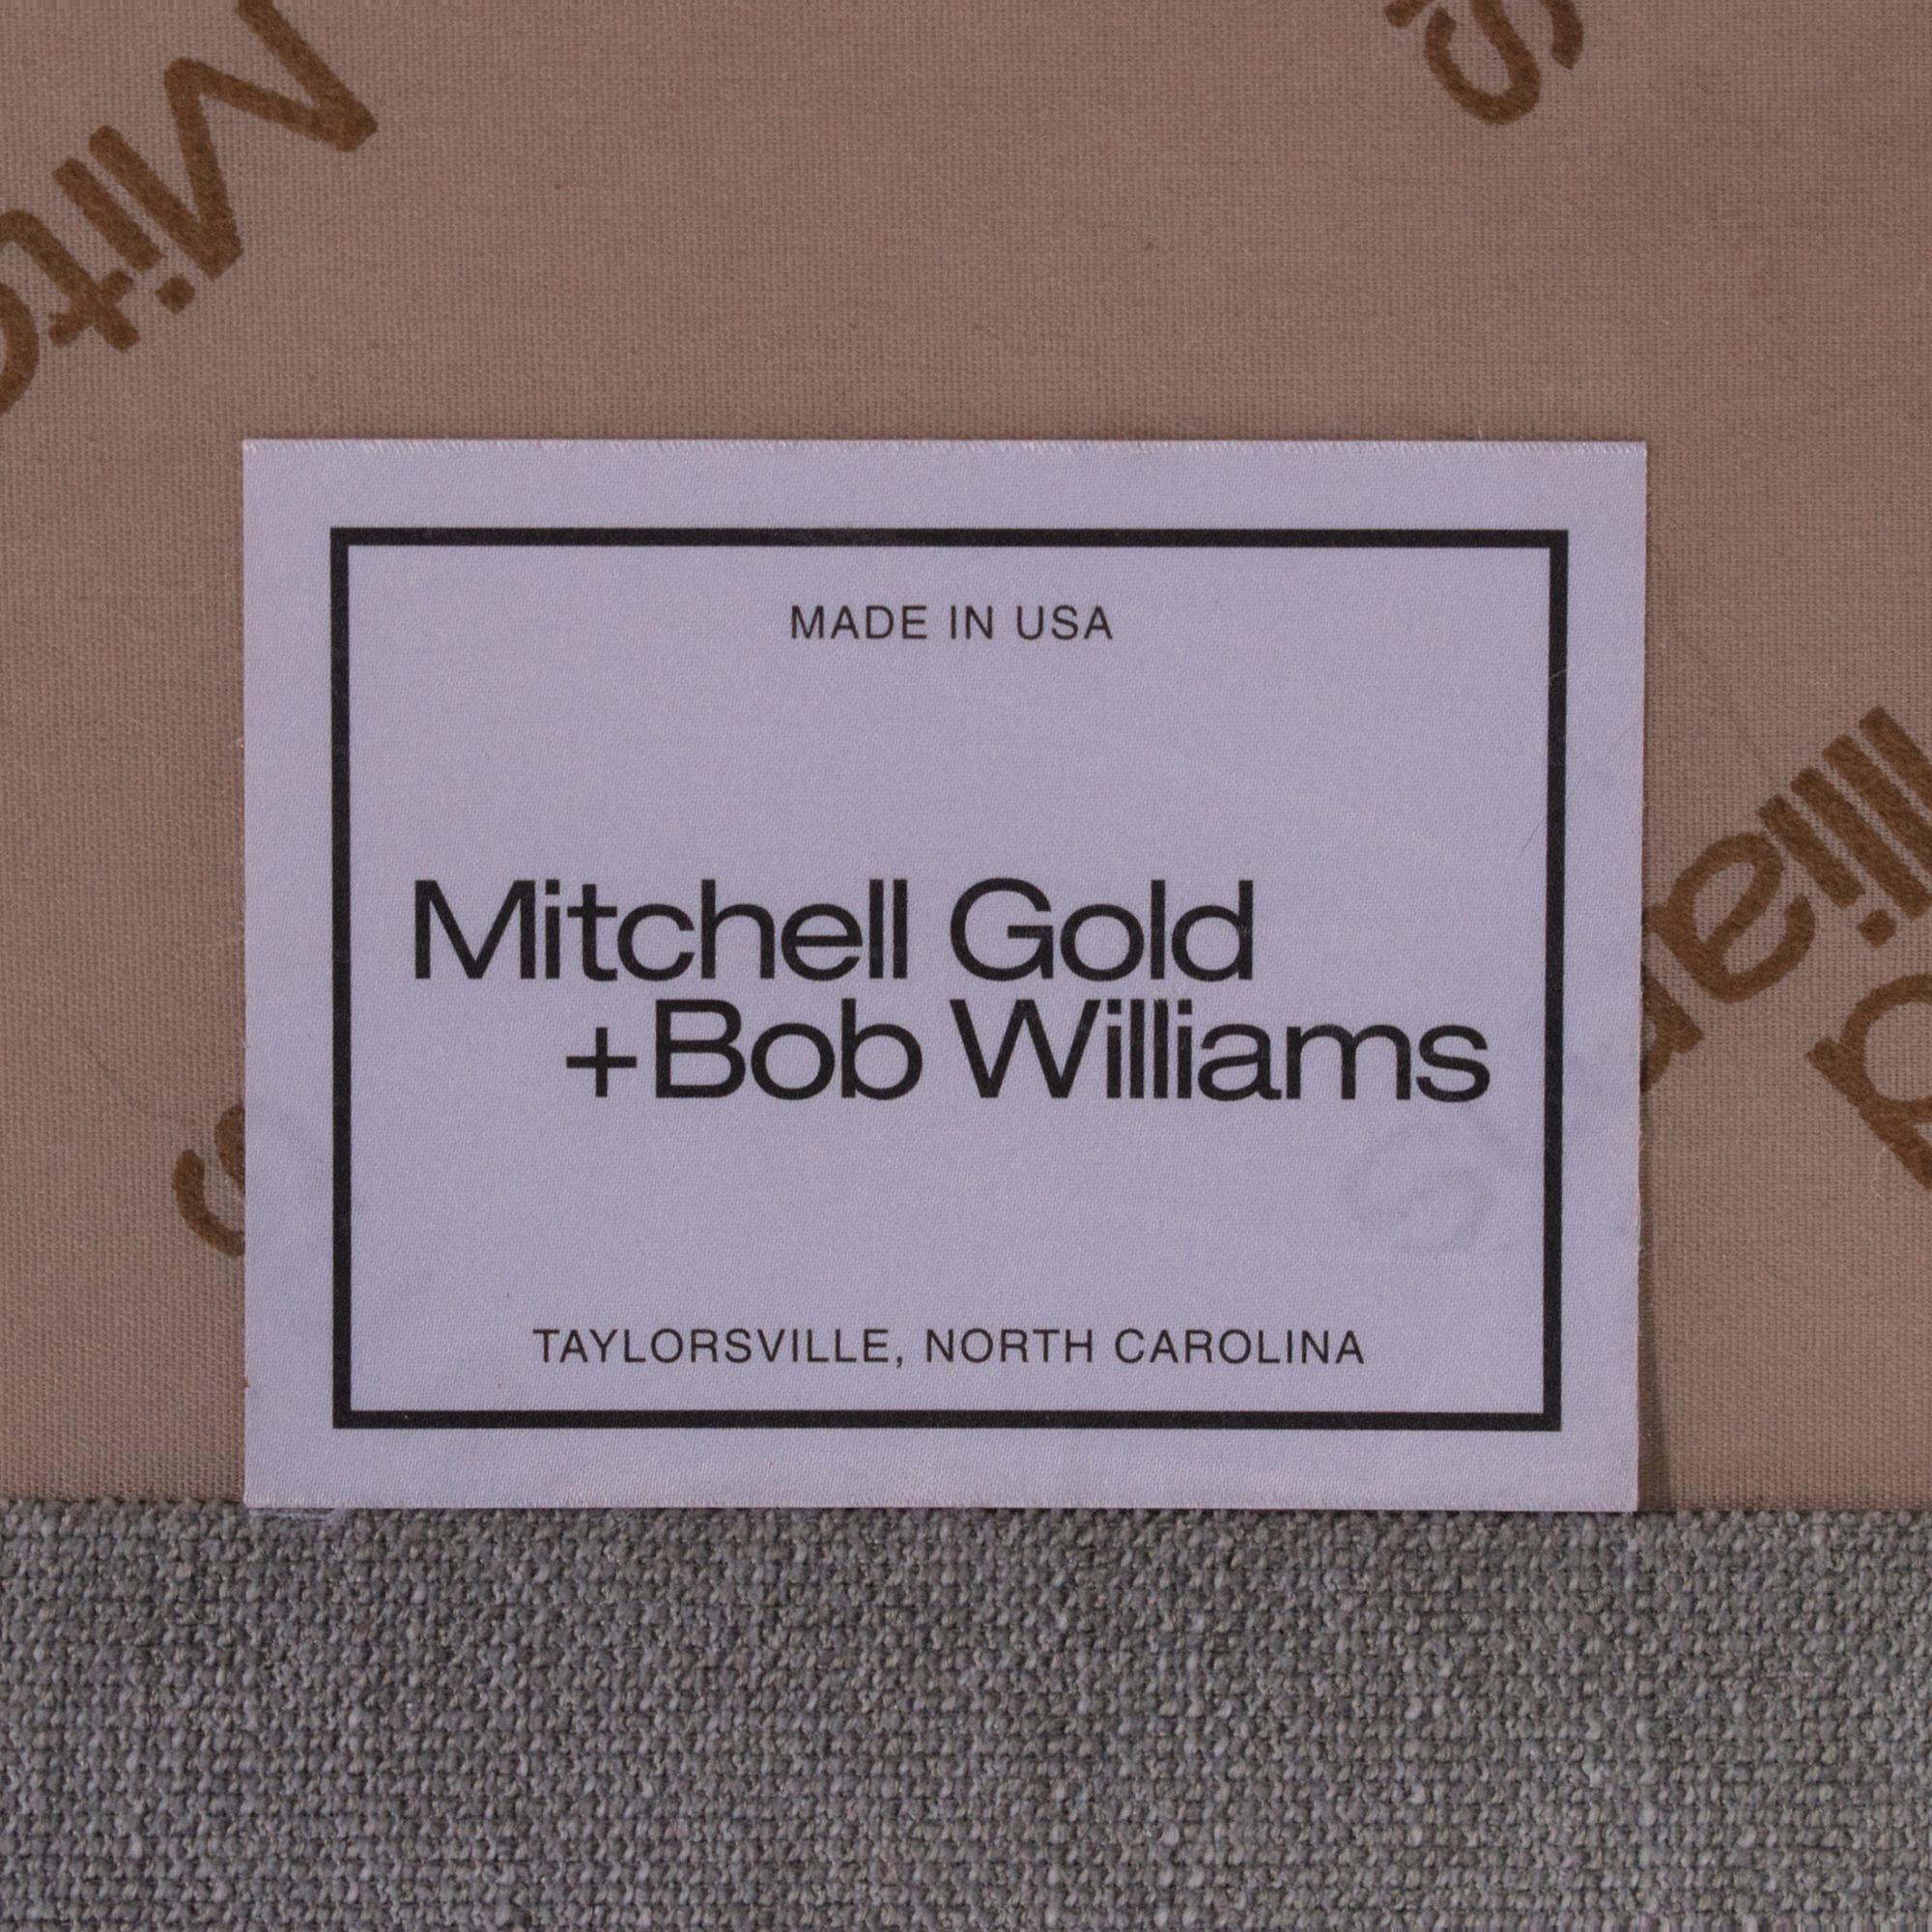 Mitchell Gold + Bob Williams Mitchell Gold + Bob Williams Keaton Shelter Sectional Sofa coupon